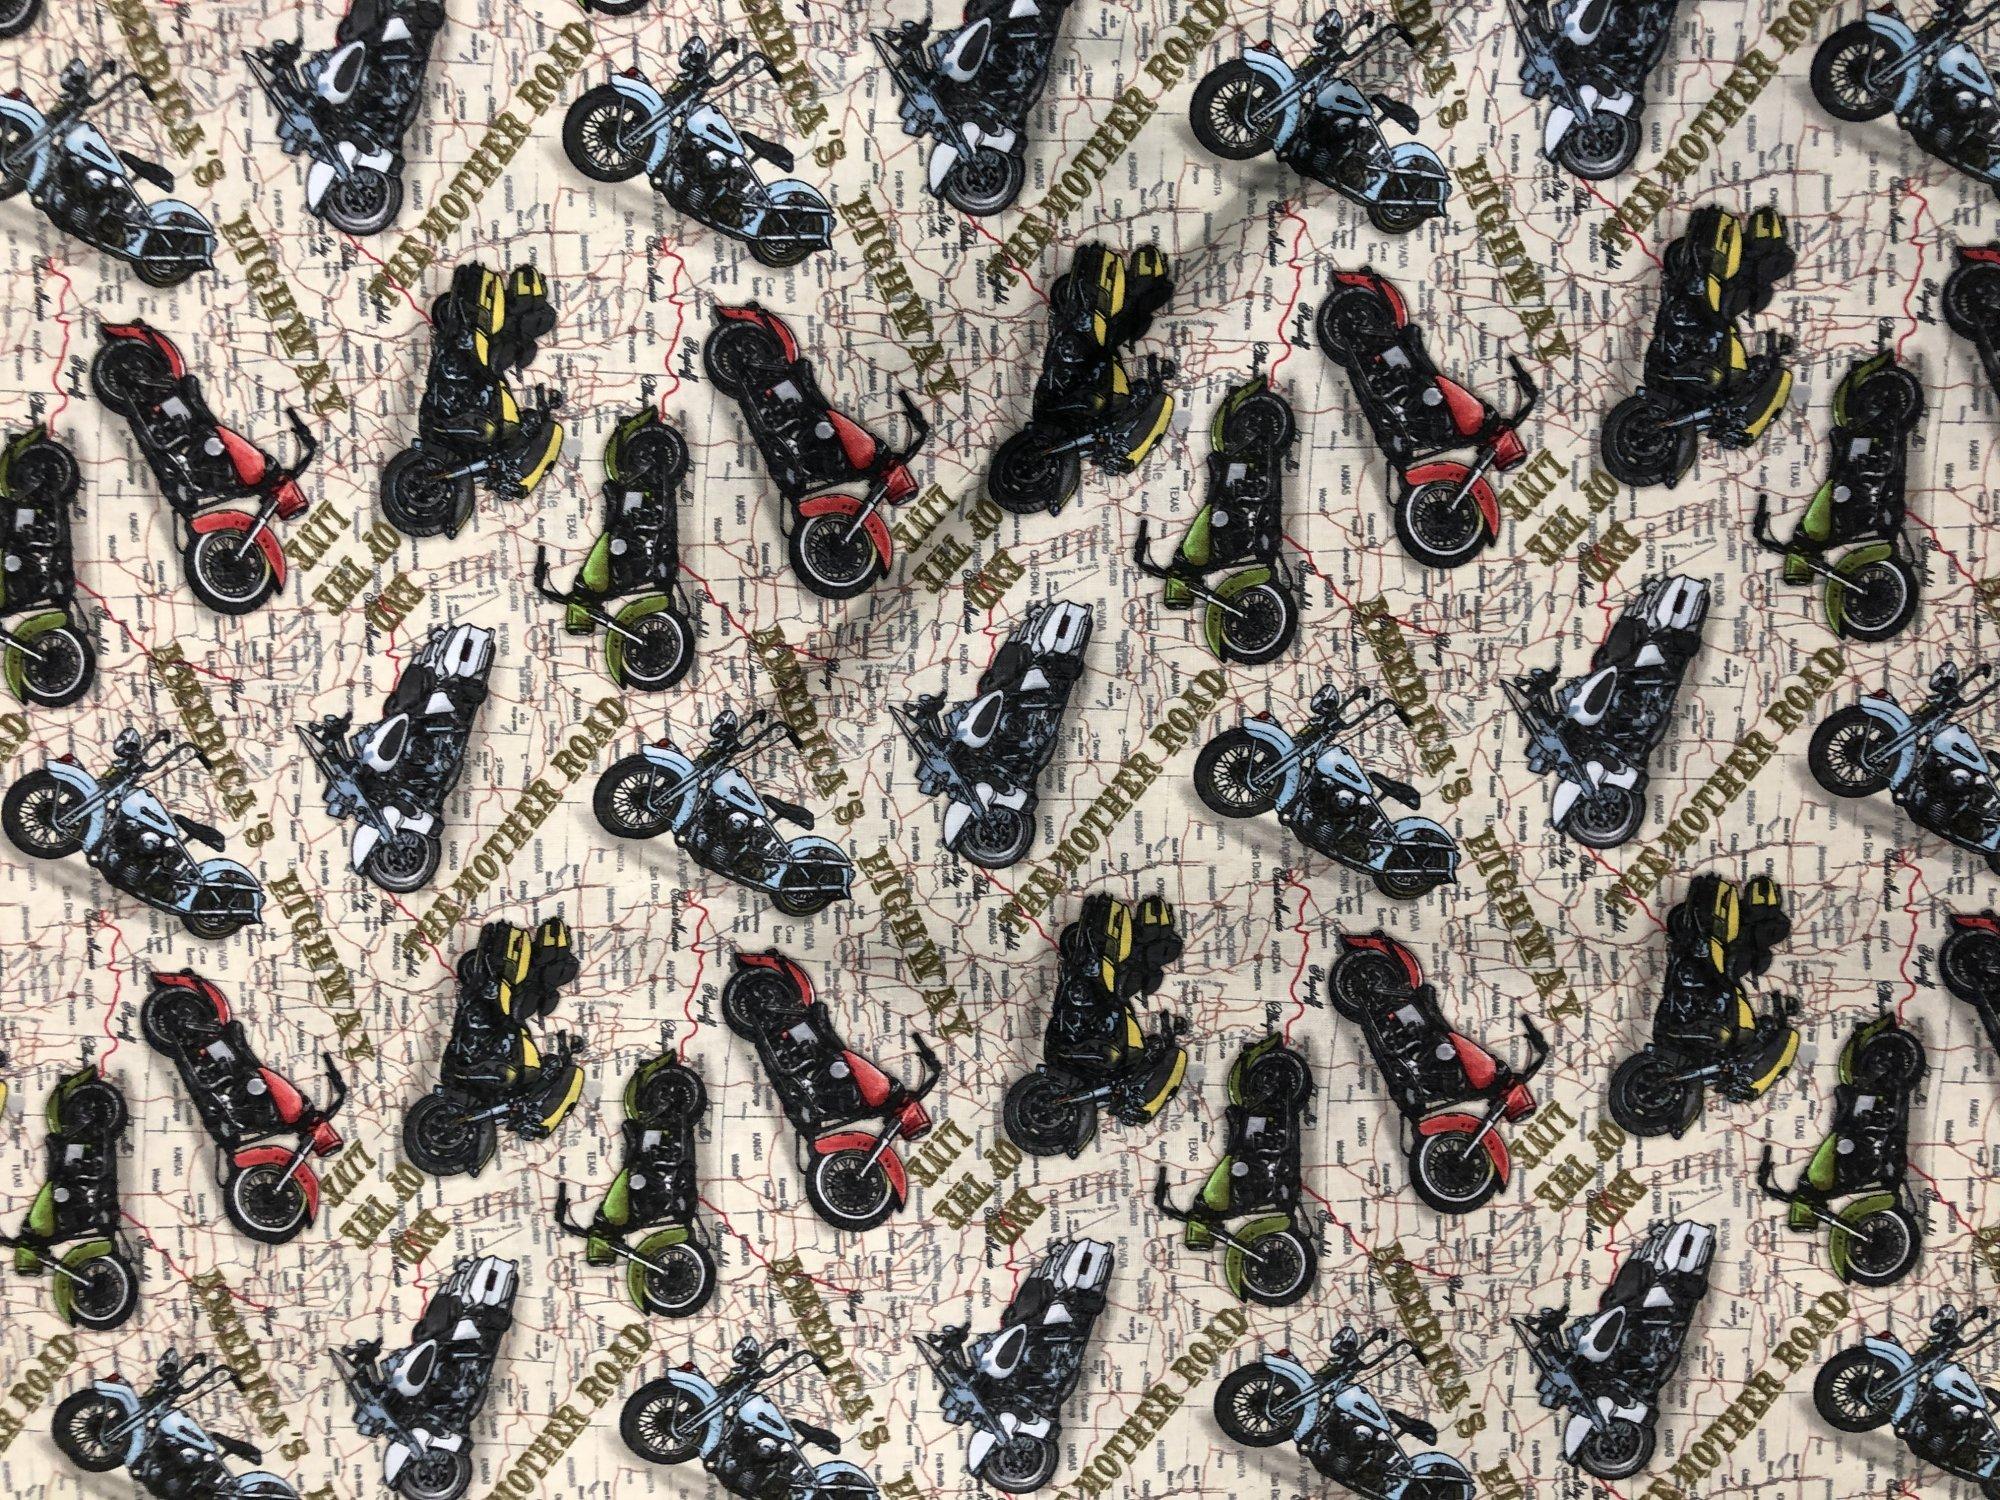 American Dream Motorcycles